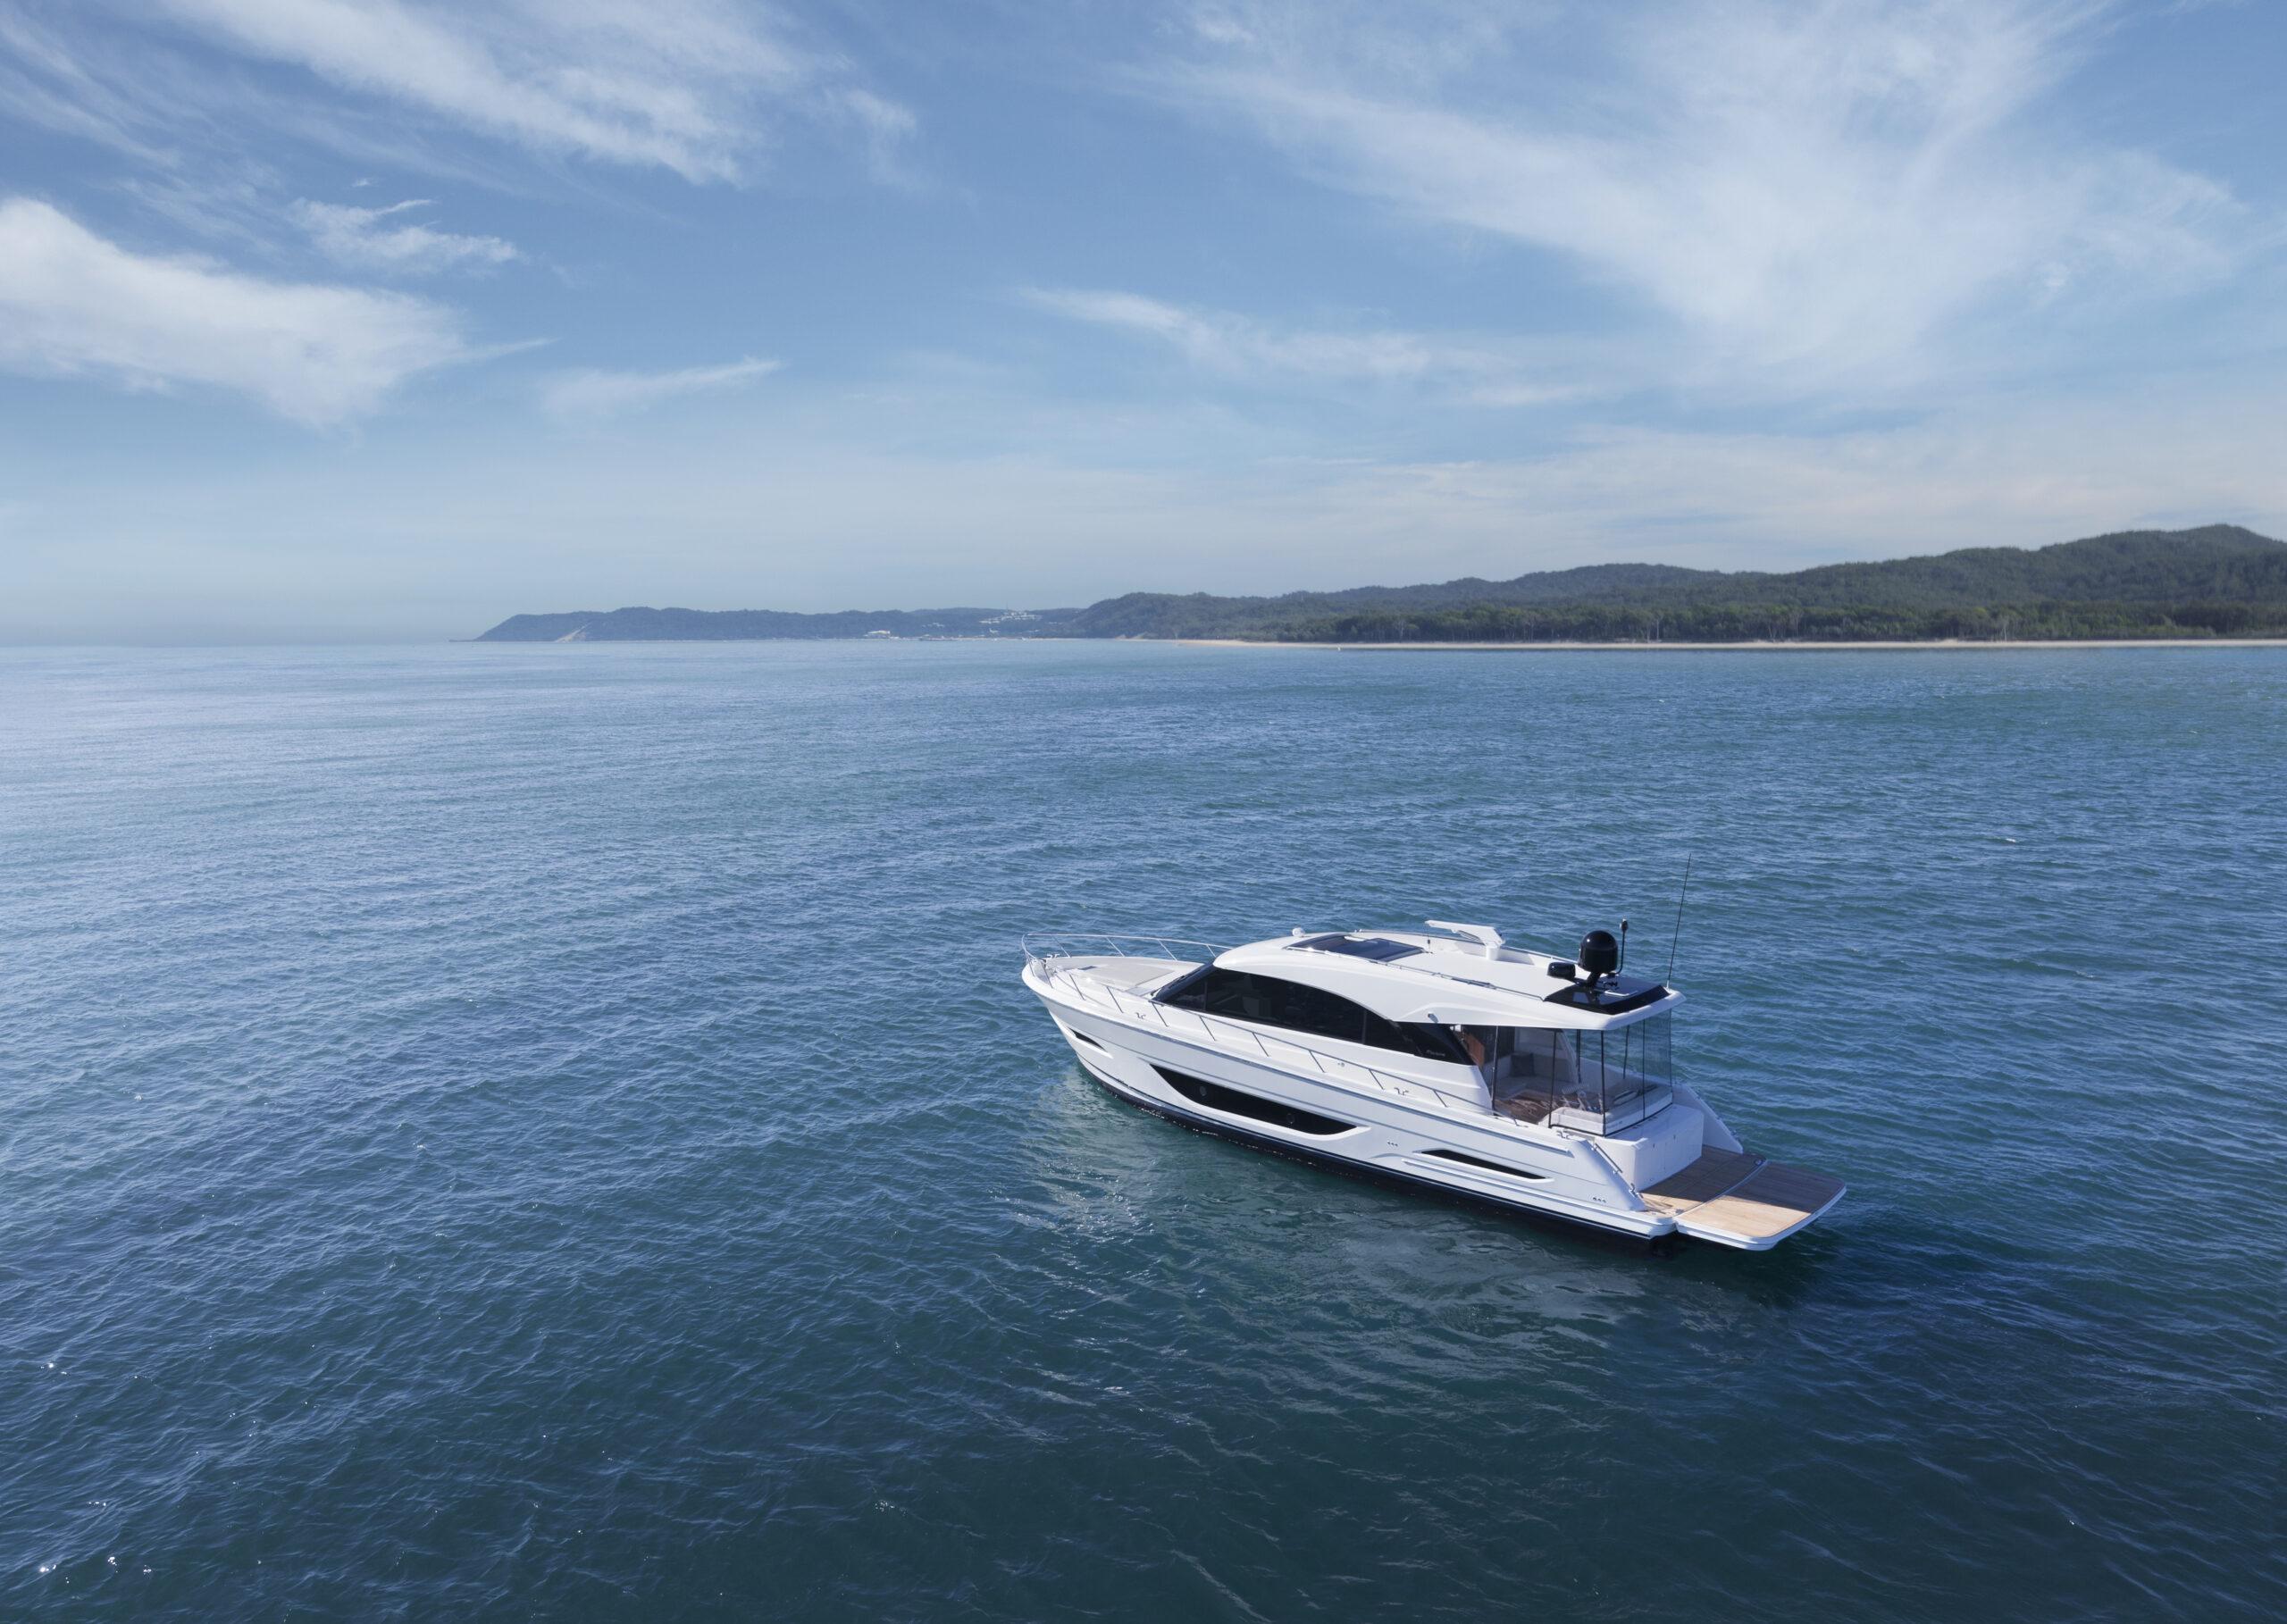 Maritimo S55 anchored